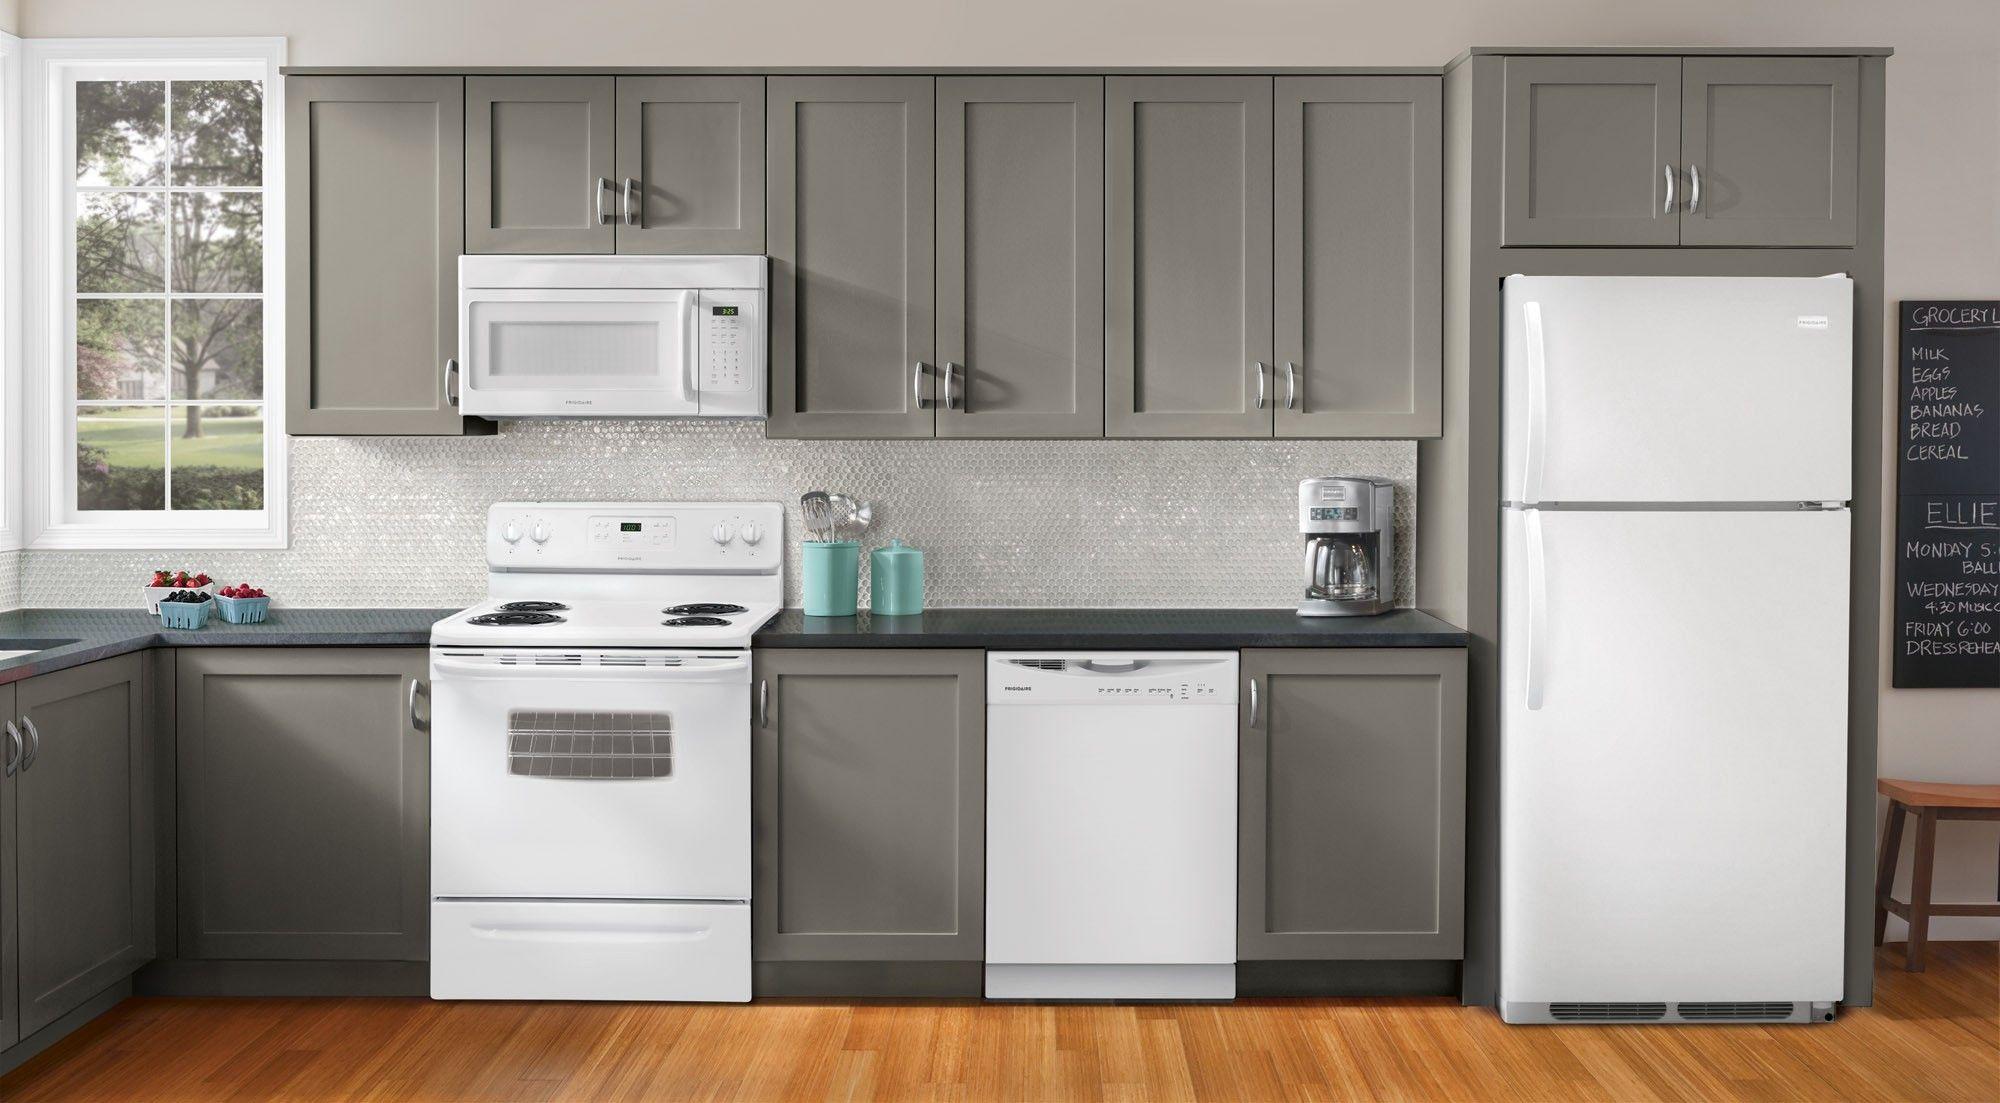 White appliances, grey neutral backsplash